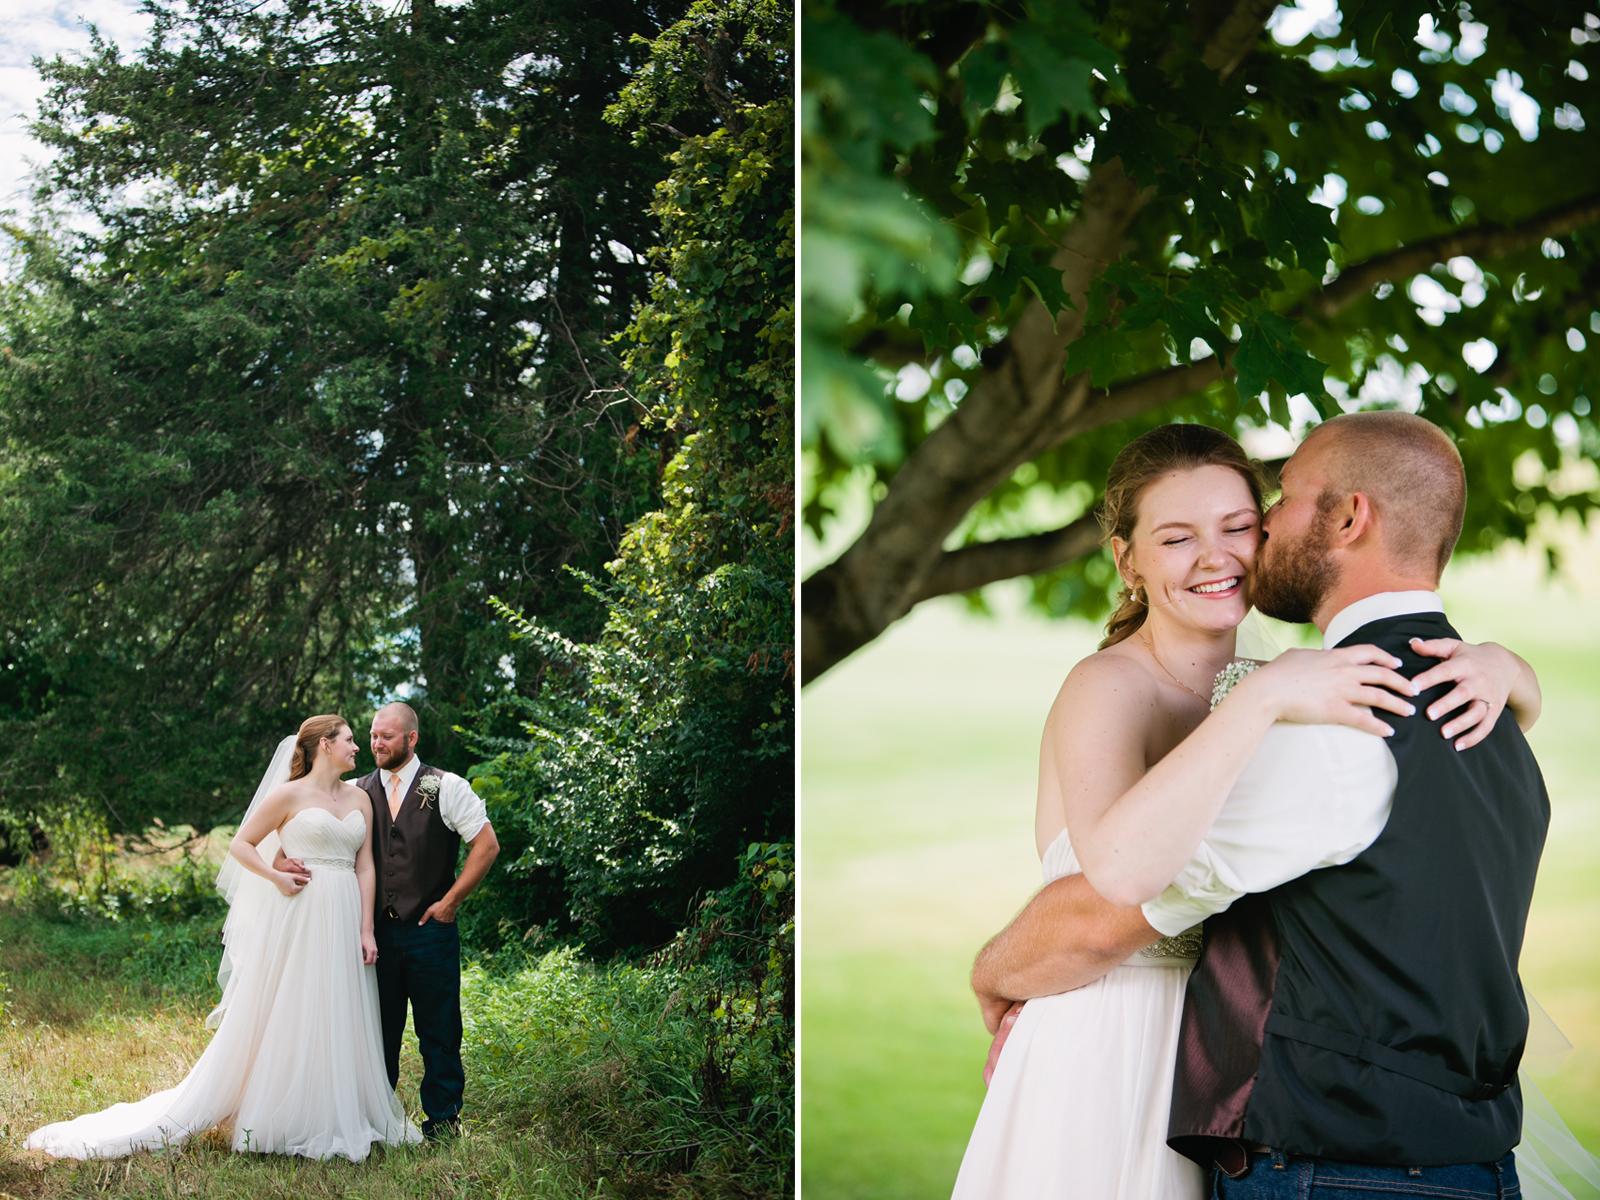 Waverly_wedding02.jpg